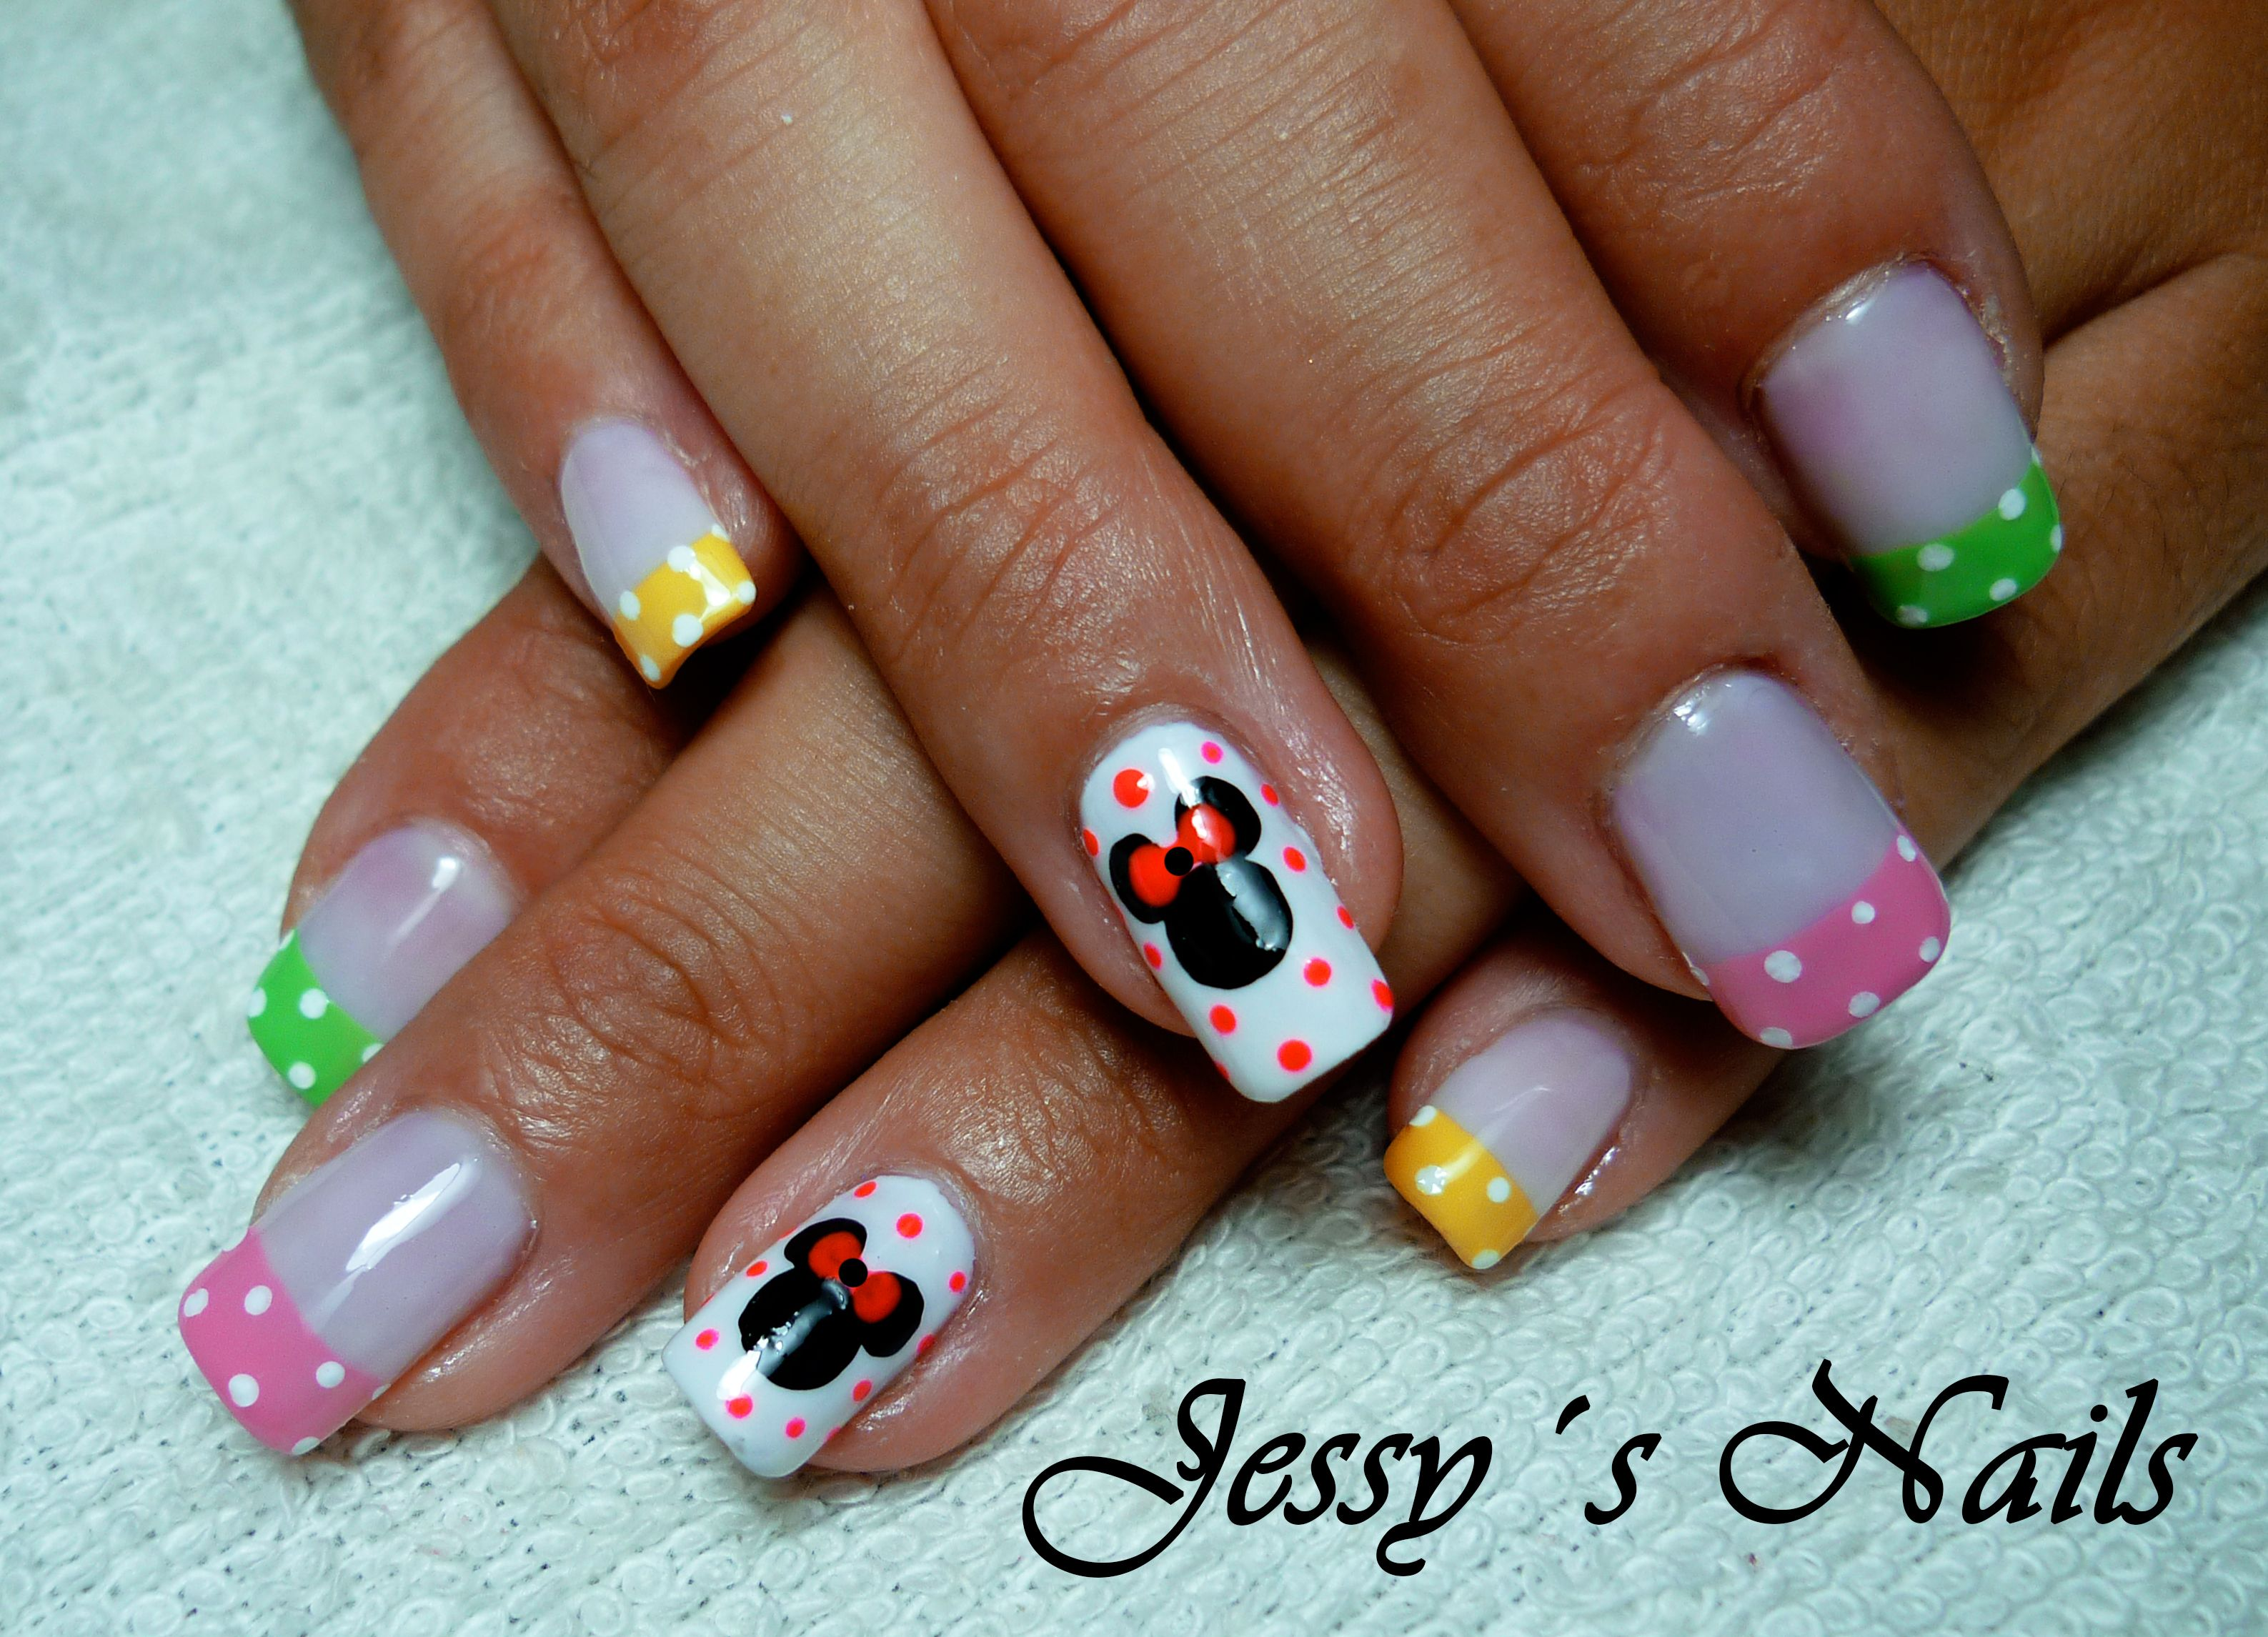 uñas de minnie mouse #nail art | UÑAS CON LUNARES O PUNTOS | Pinterest